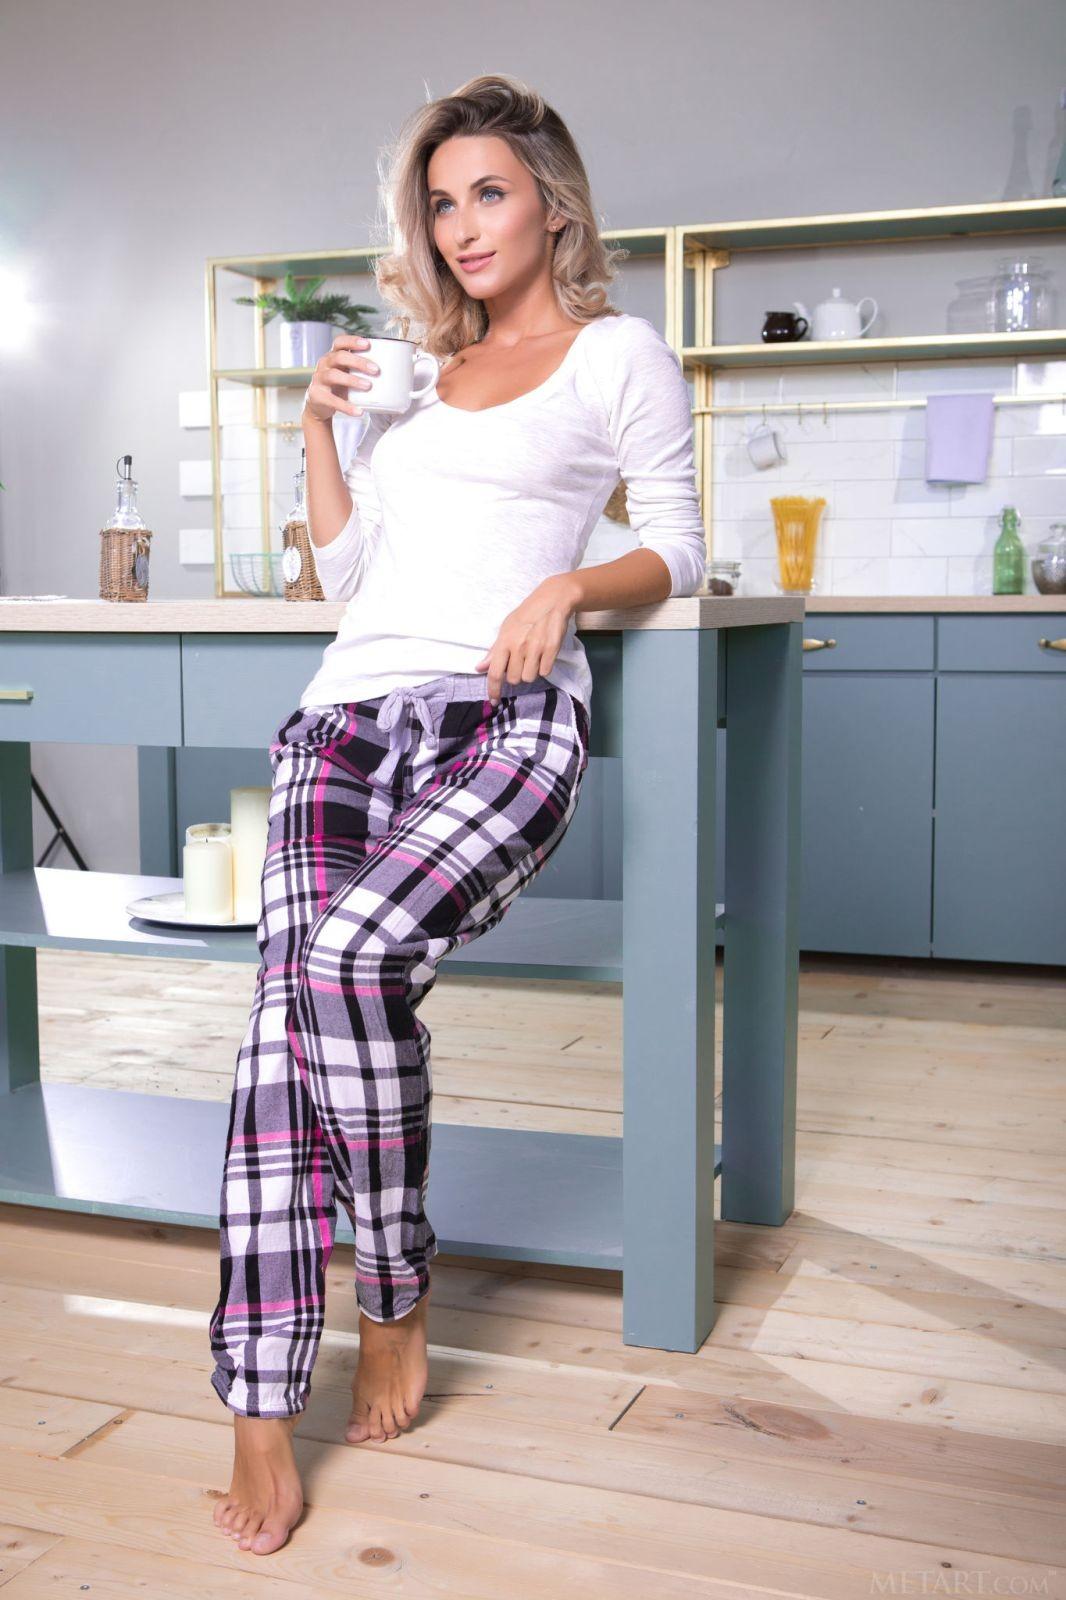 Сексуальная девушка сняла штаны на кухне - фото